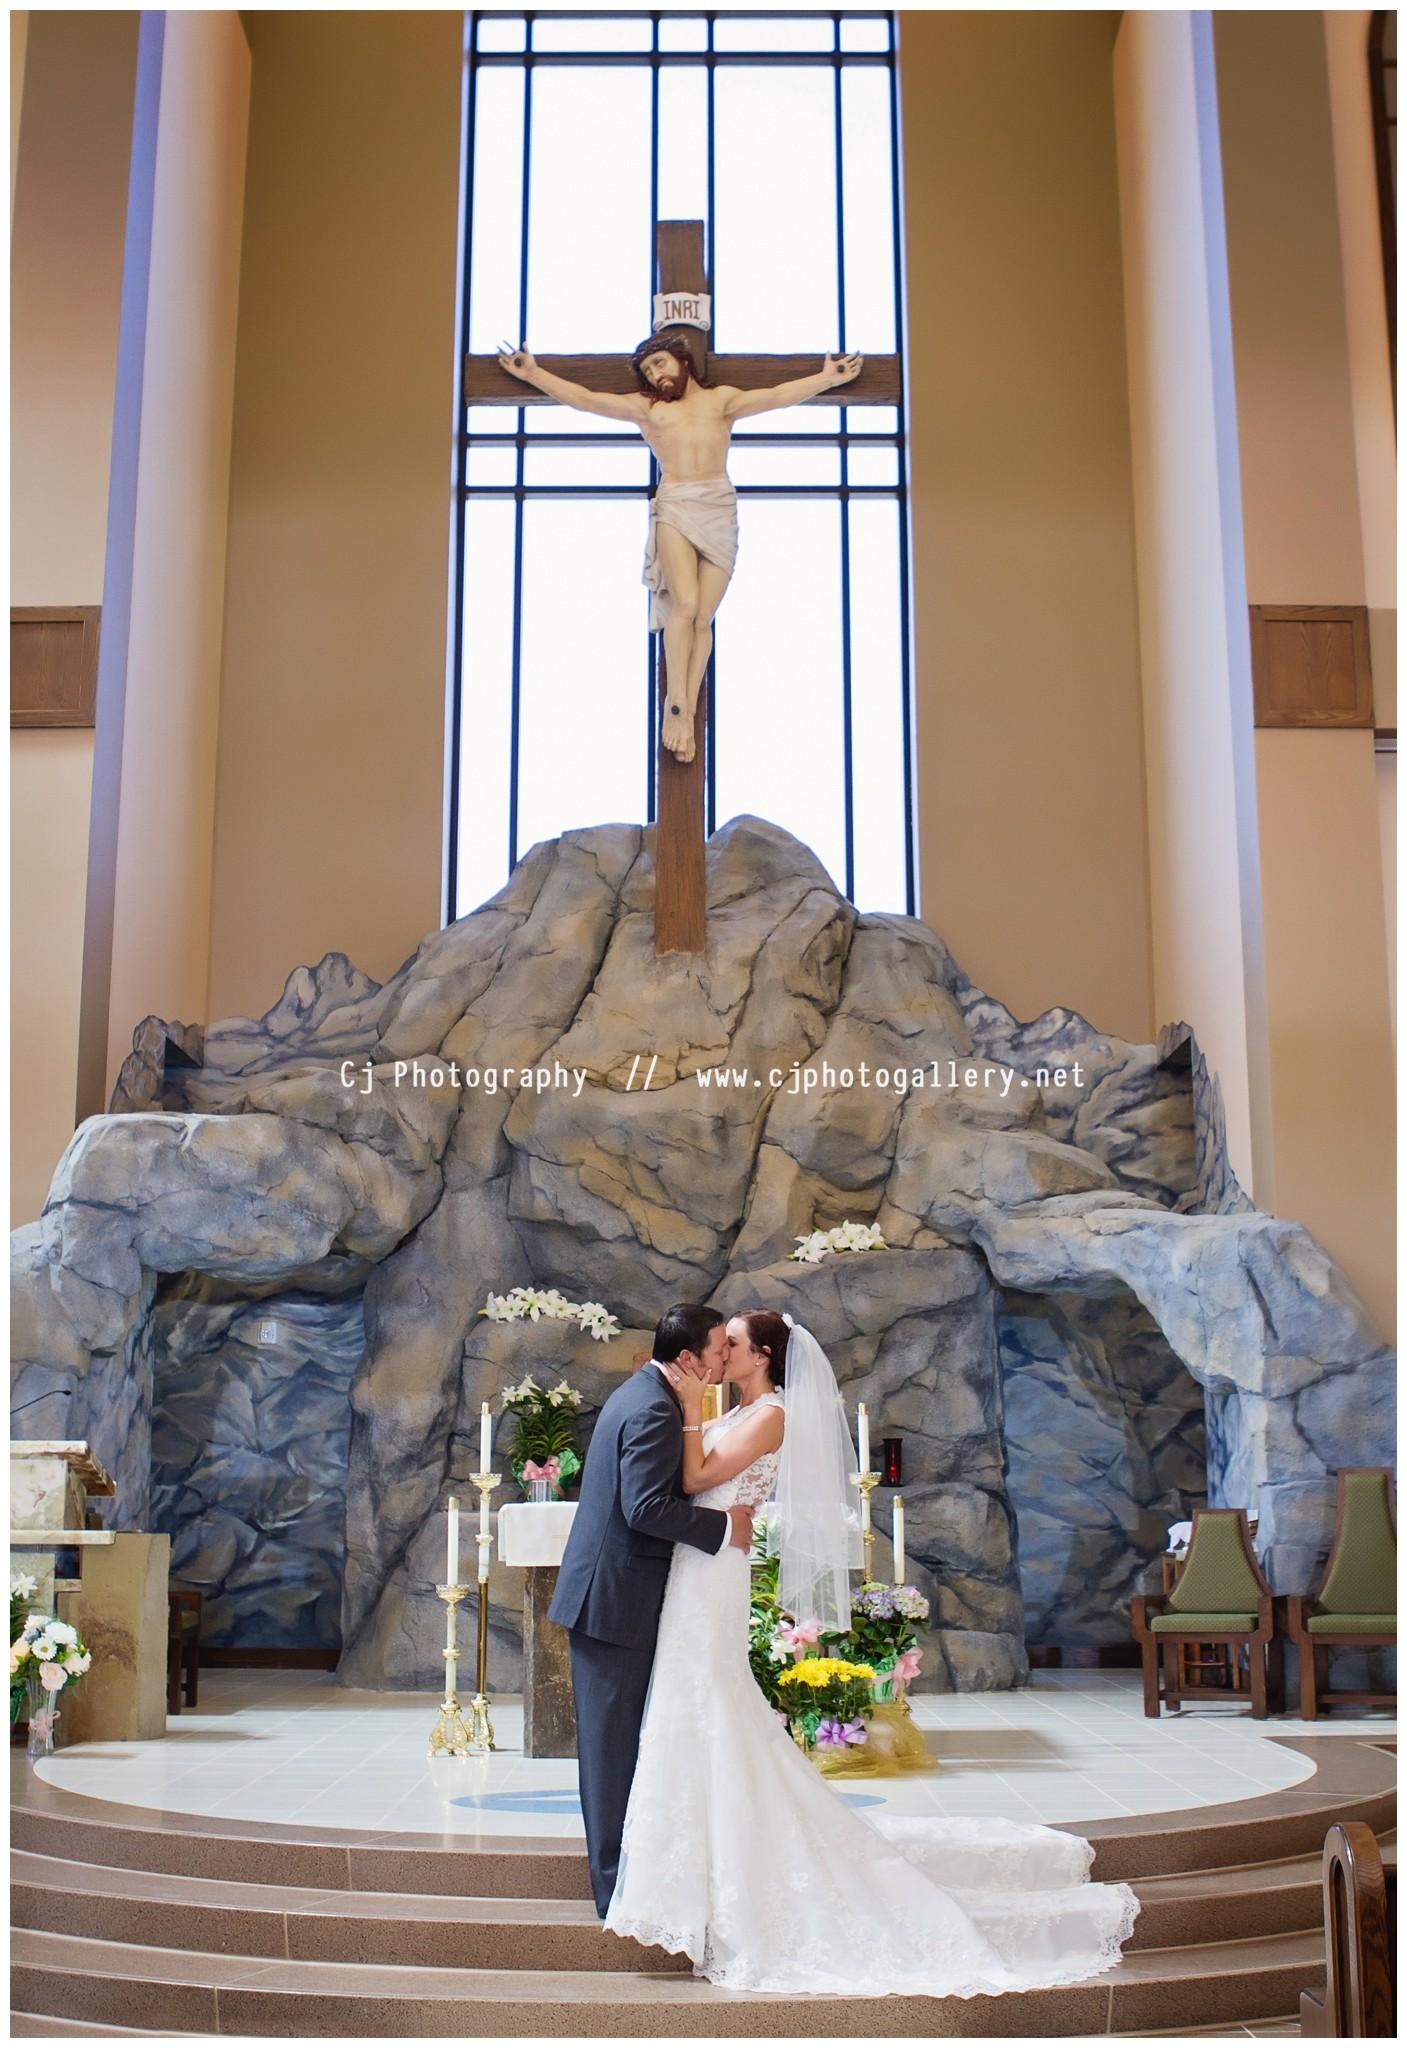 Cj Photography   www.cjphotogallery.net